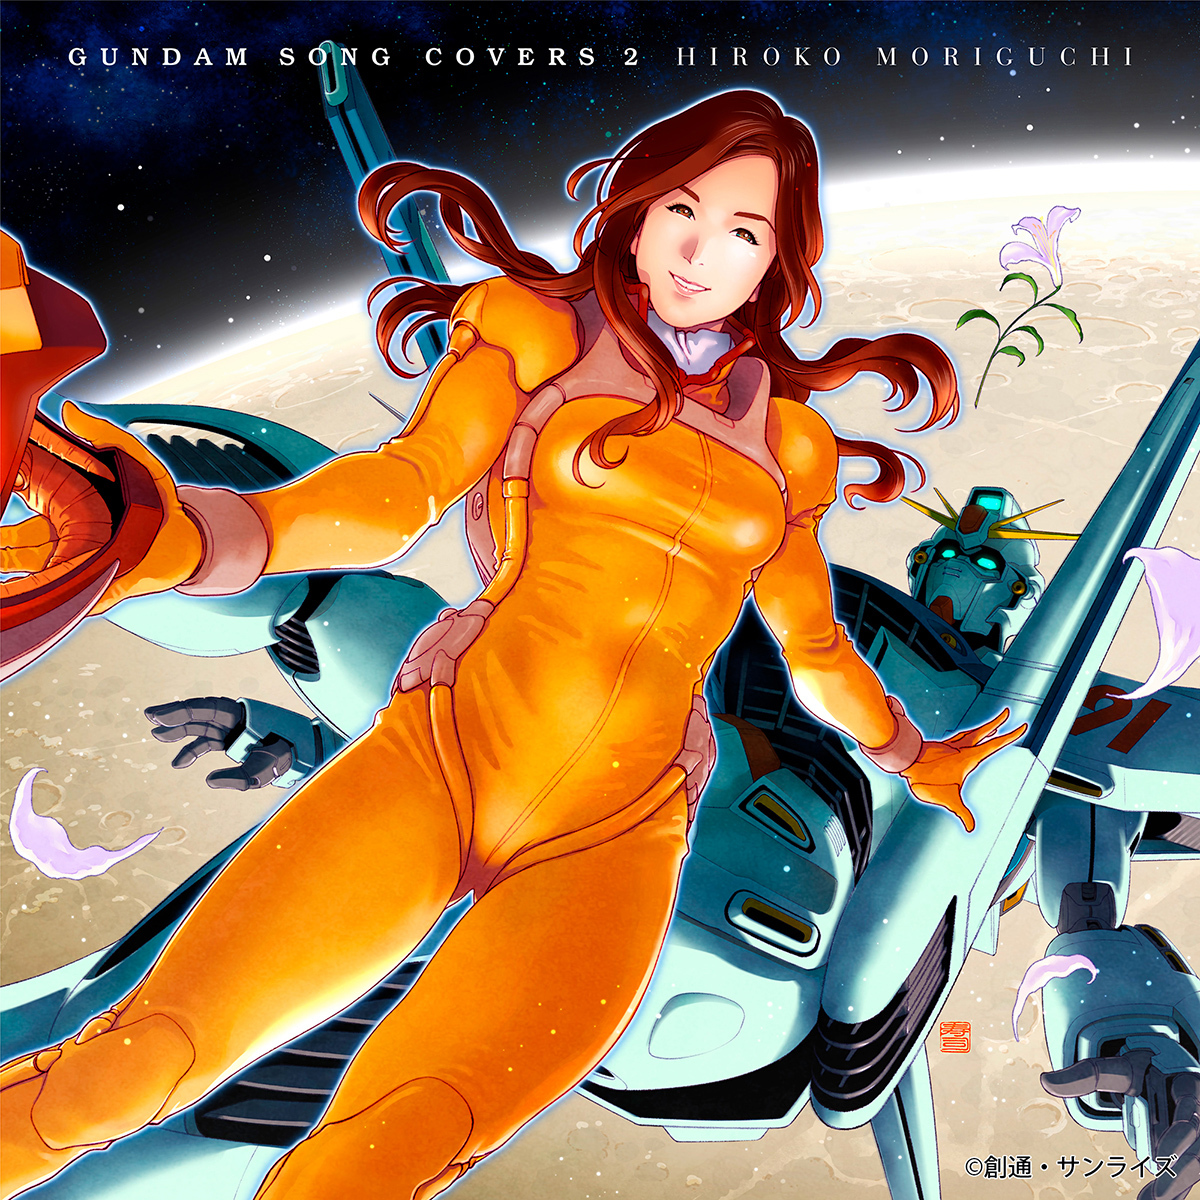 『GUNDAM SONG COVERS 2』配信ジャケット (C)創通・サンライズ